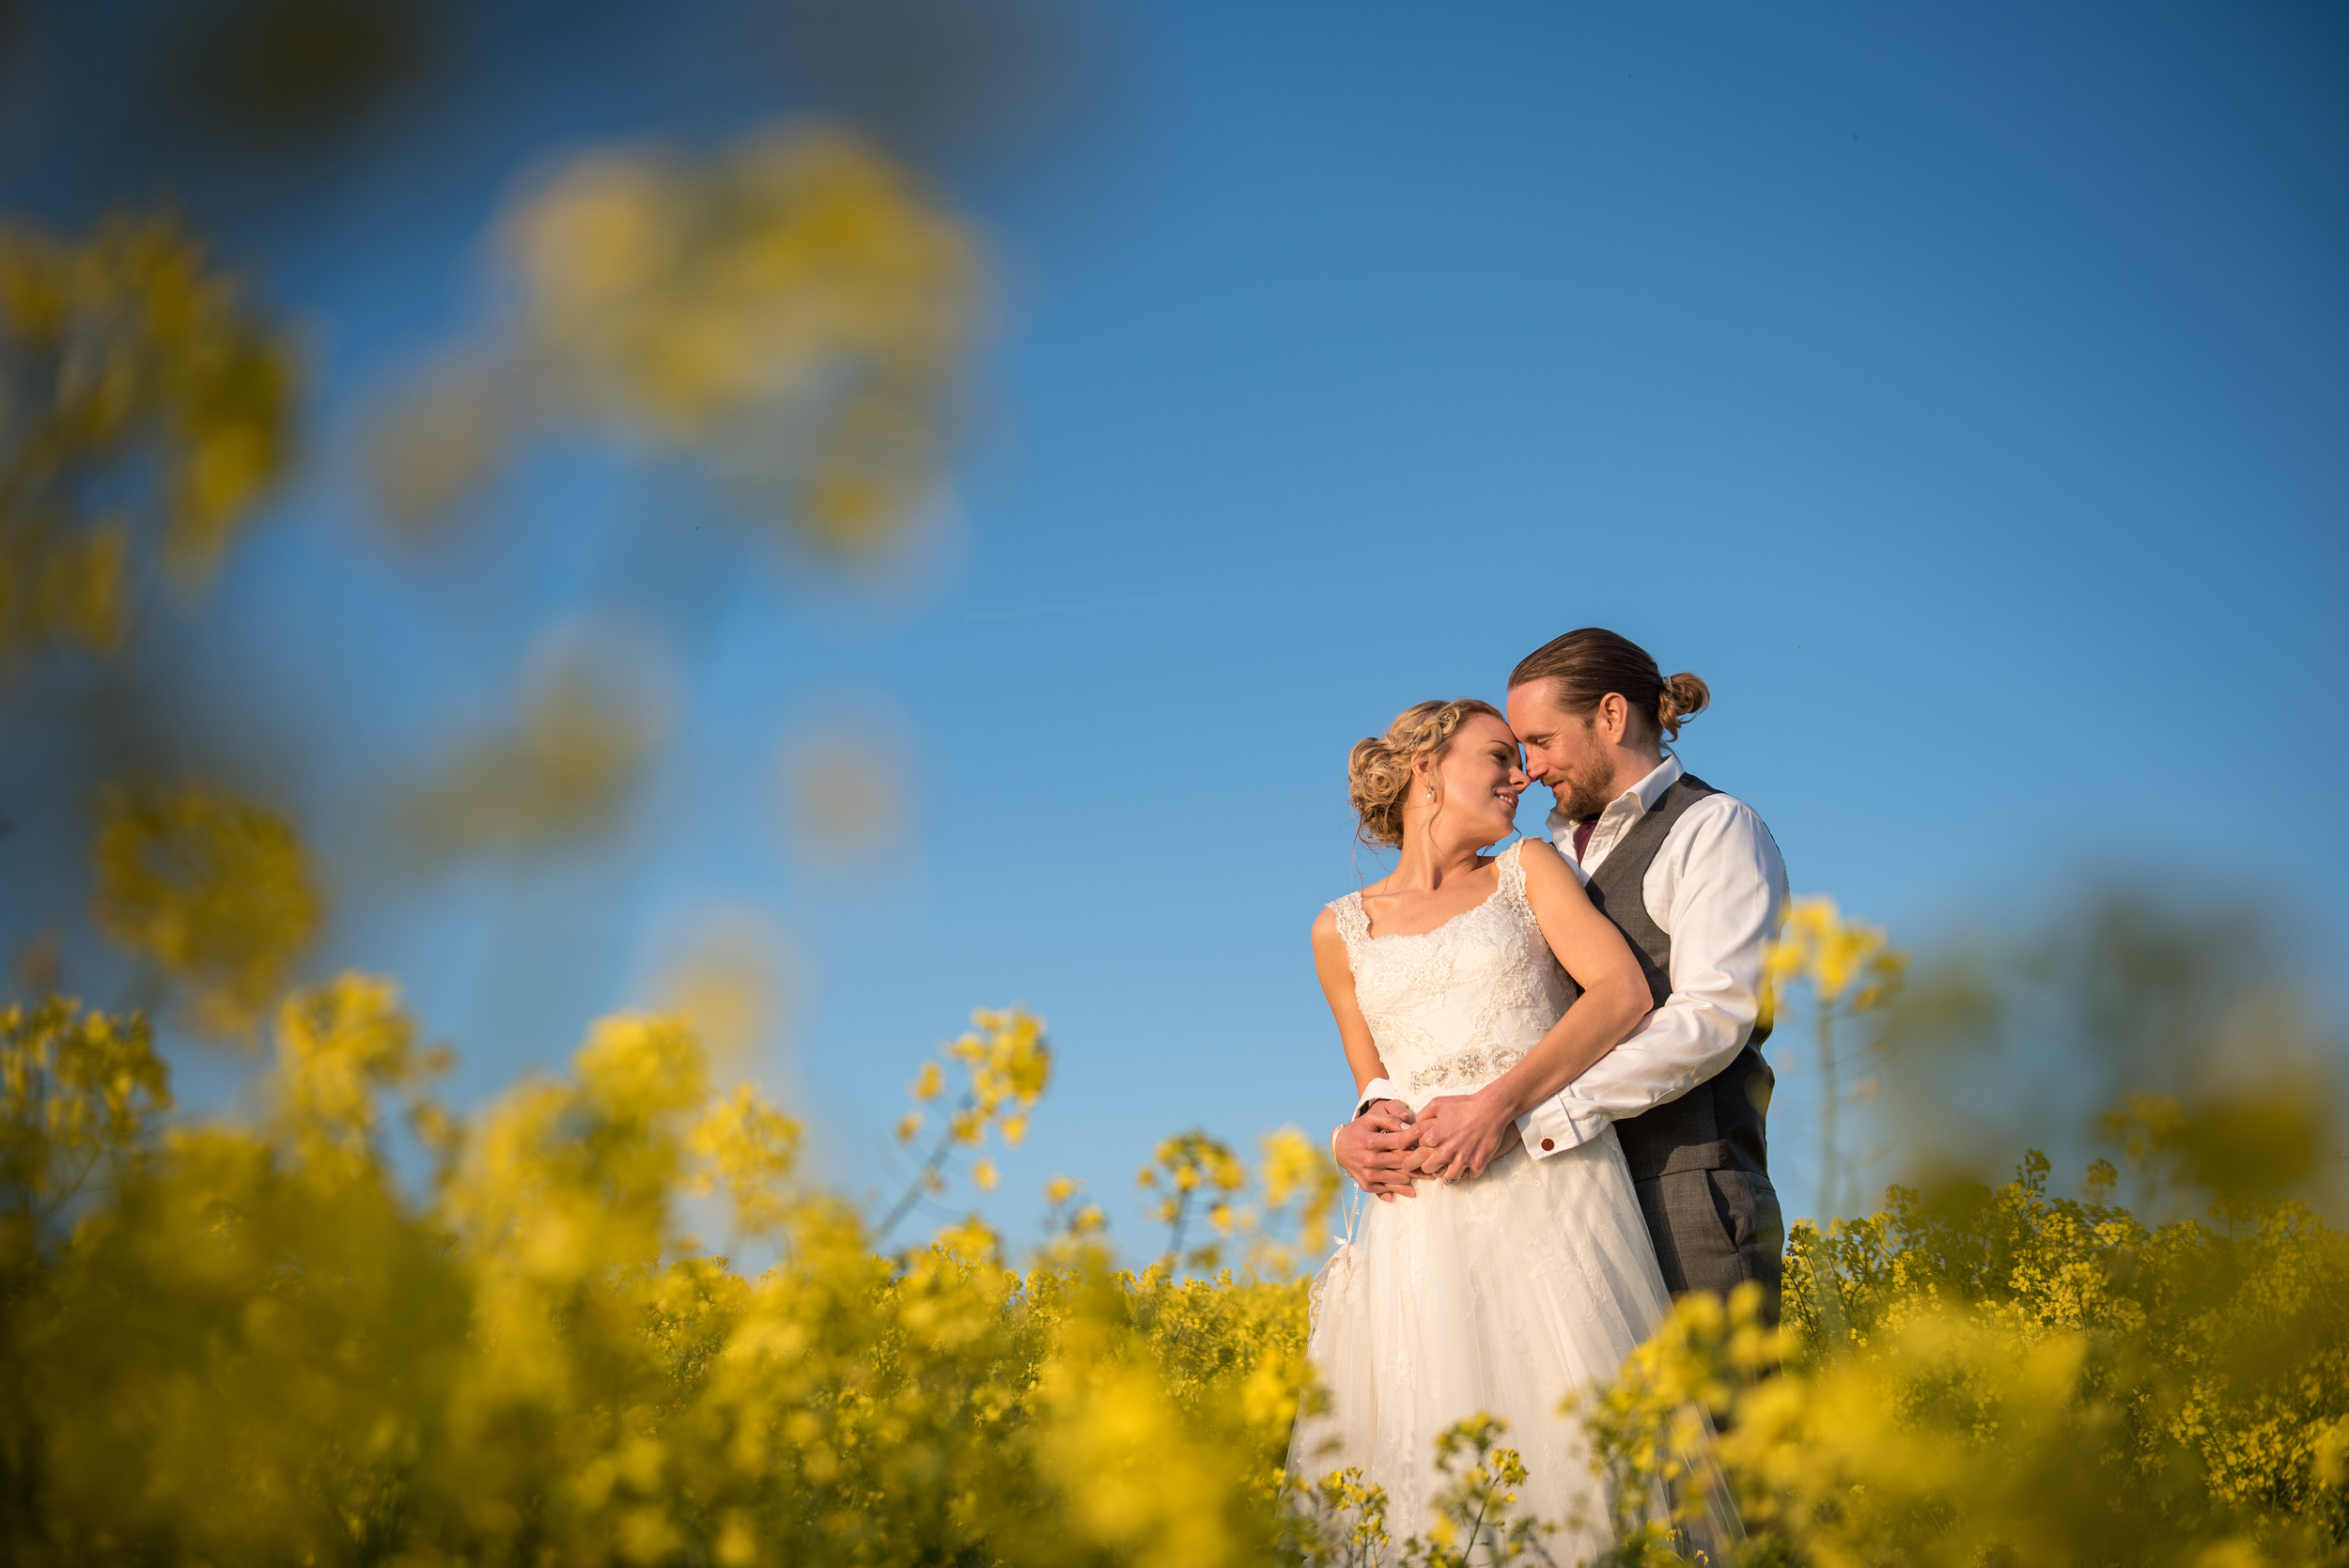 David Scholes Lancashire wedding photography 2016-48.jpg